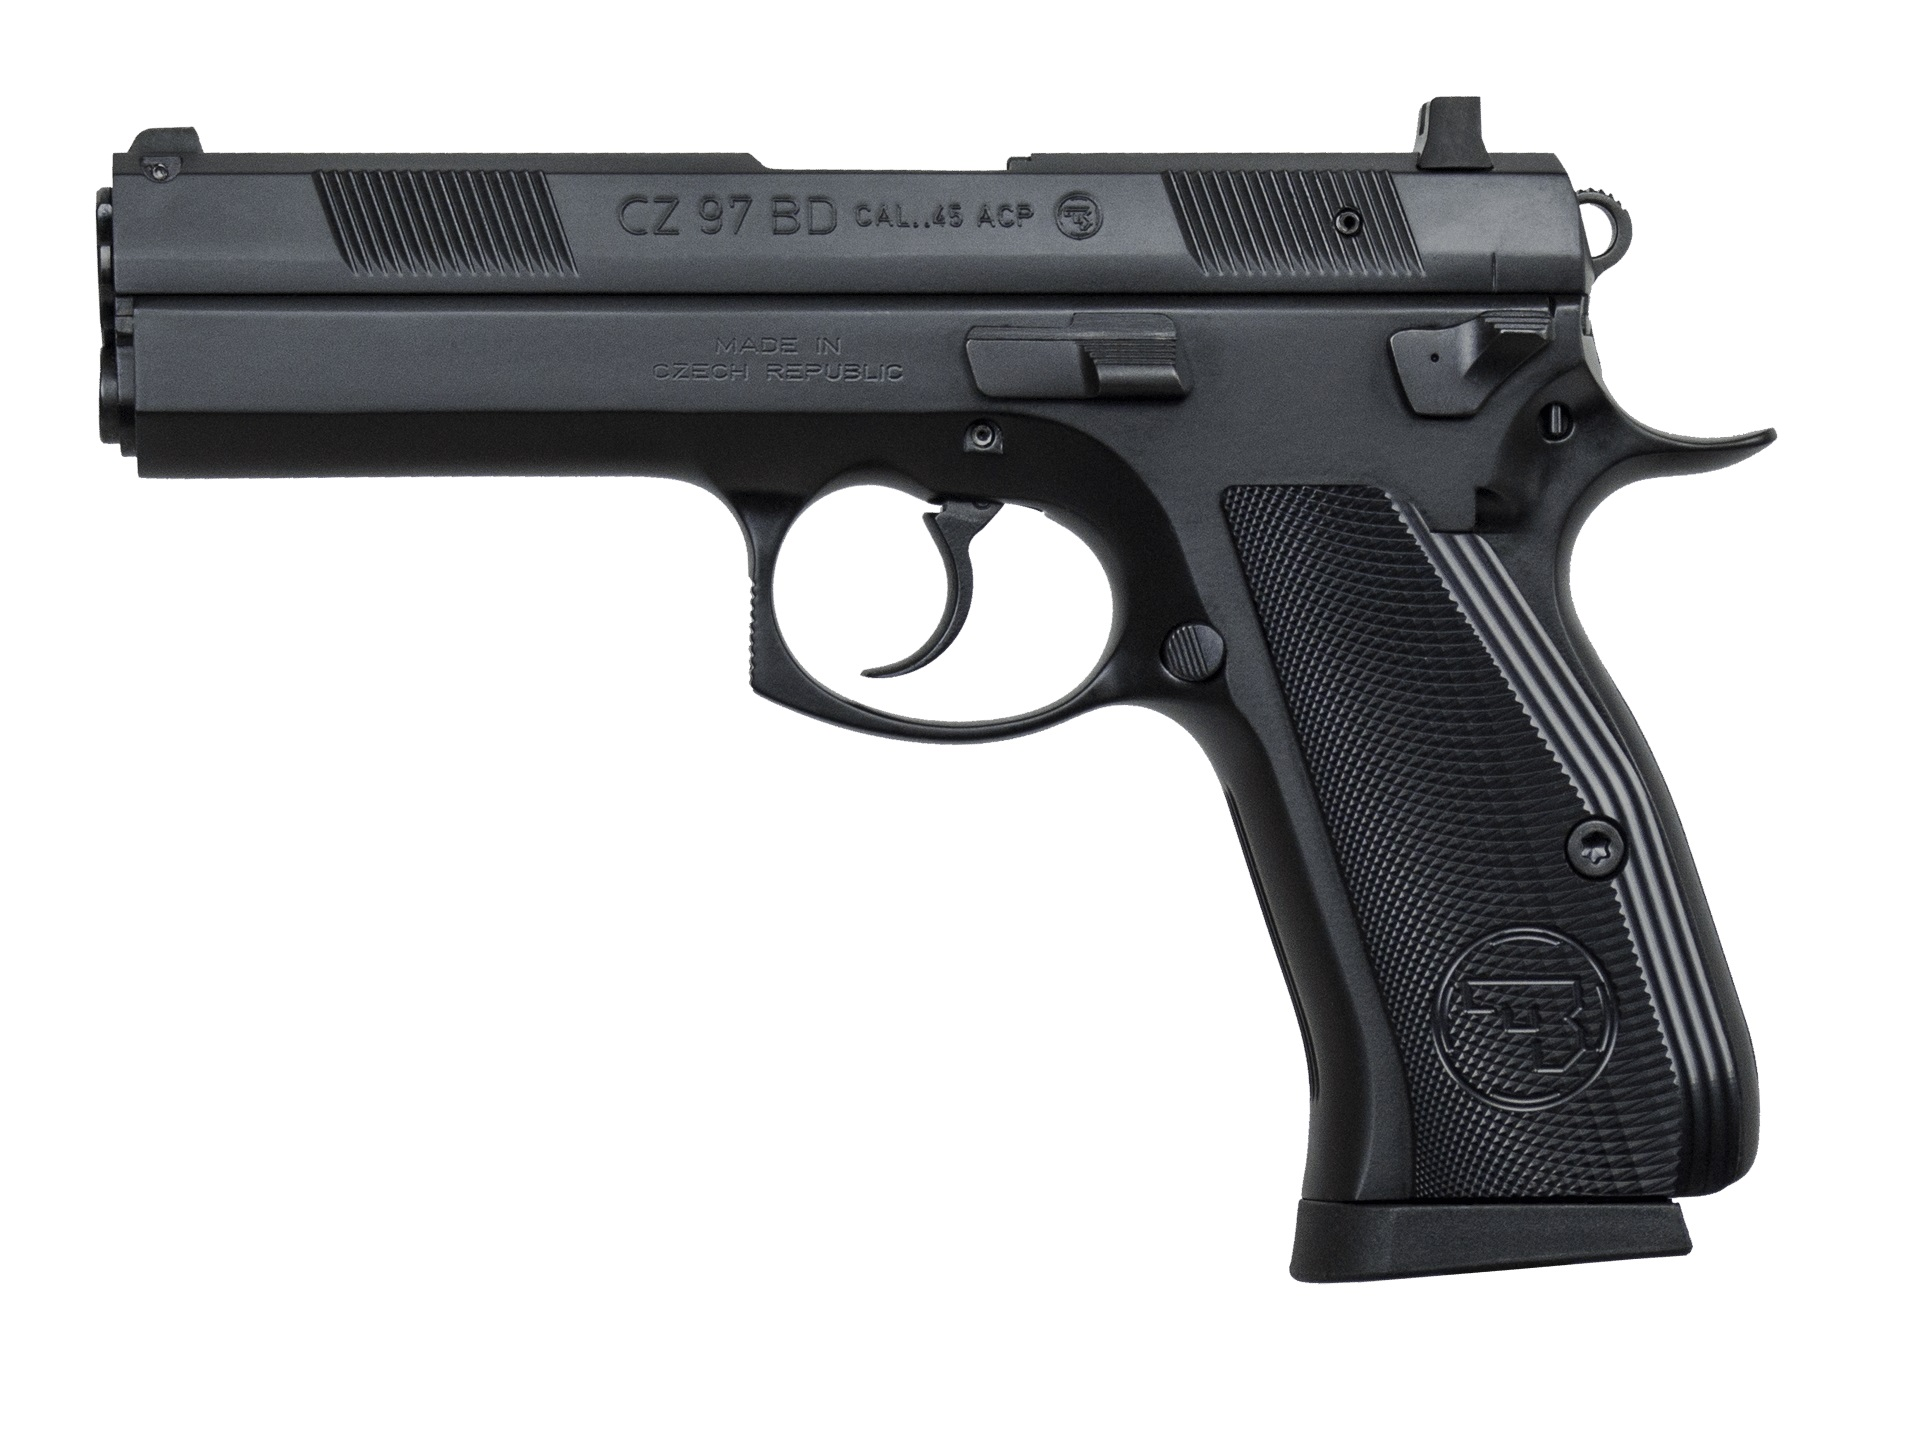 CZ-USA CZ 97 BD 45 ACP